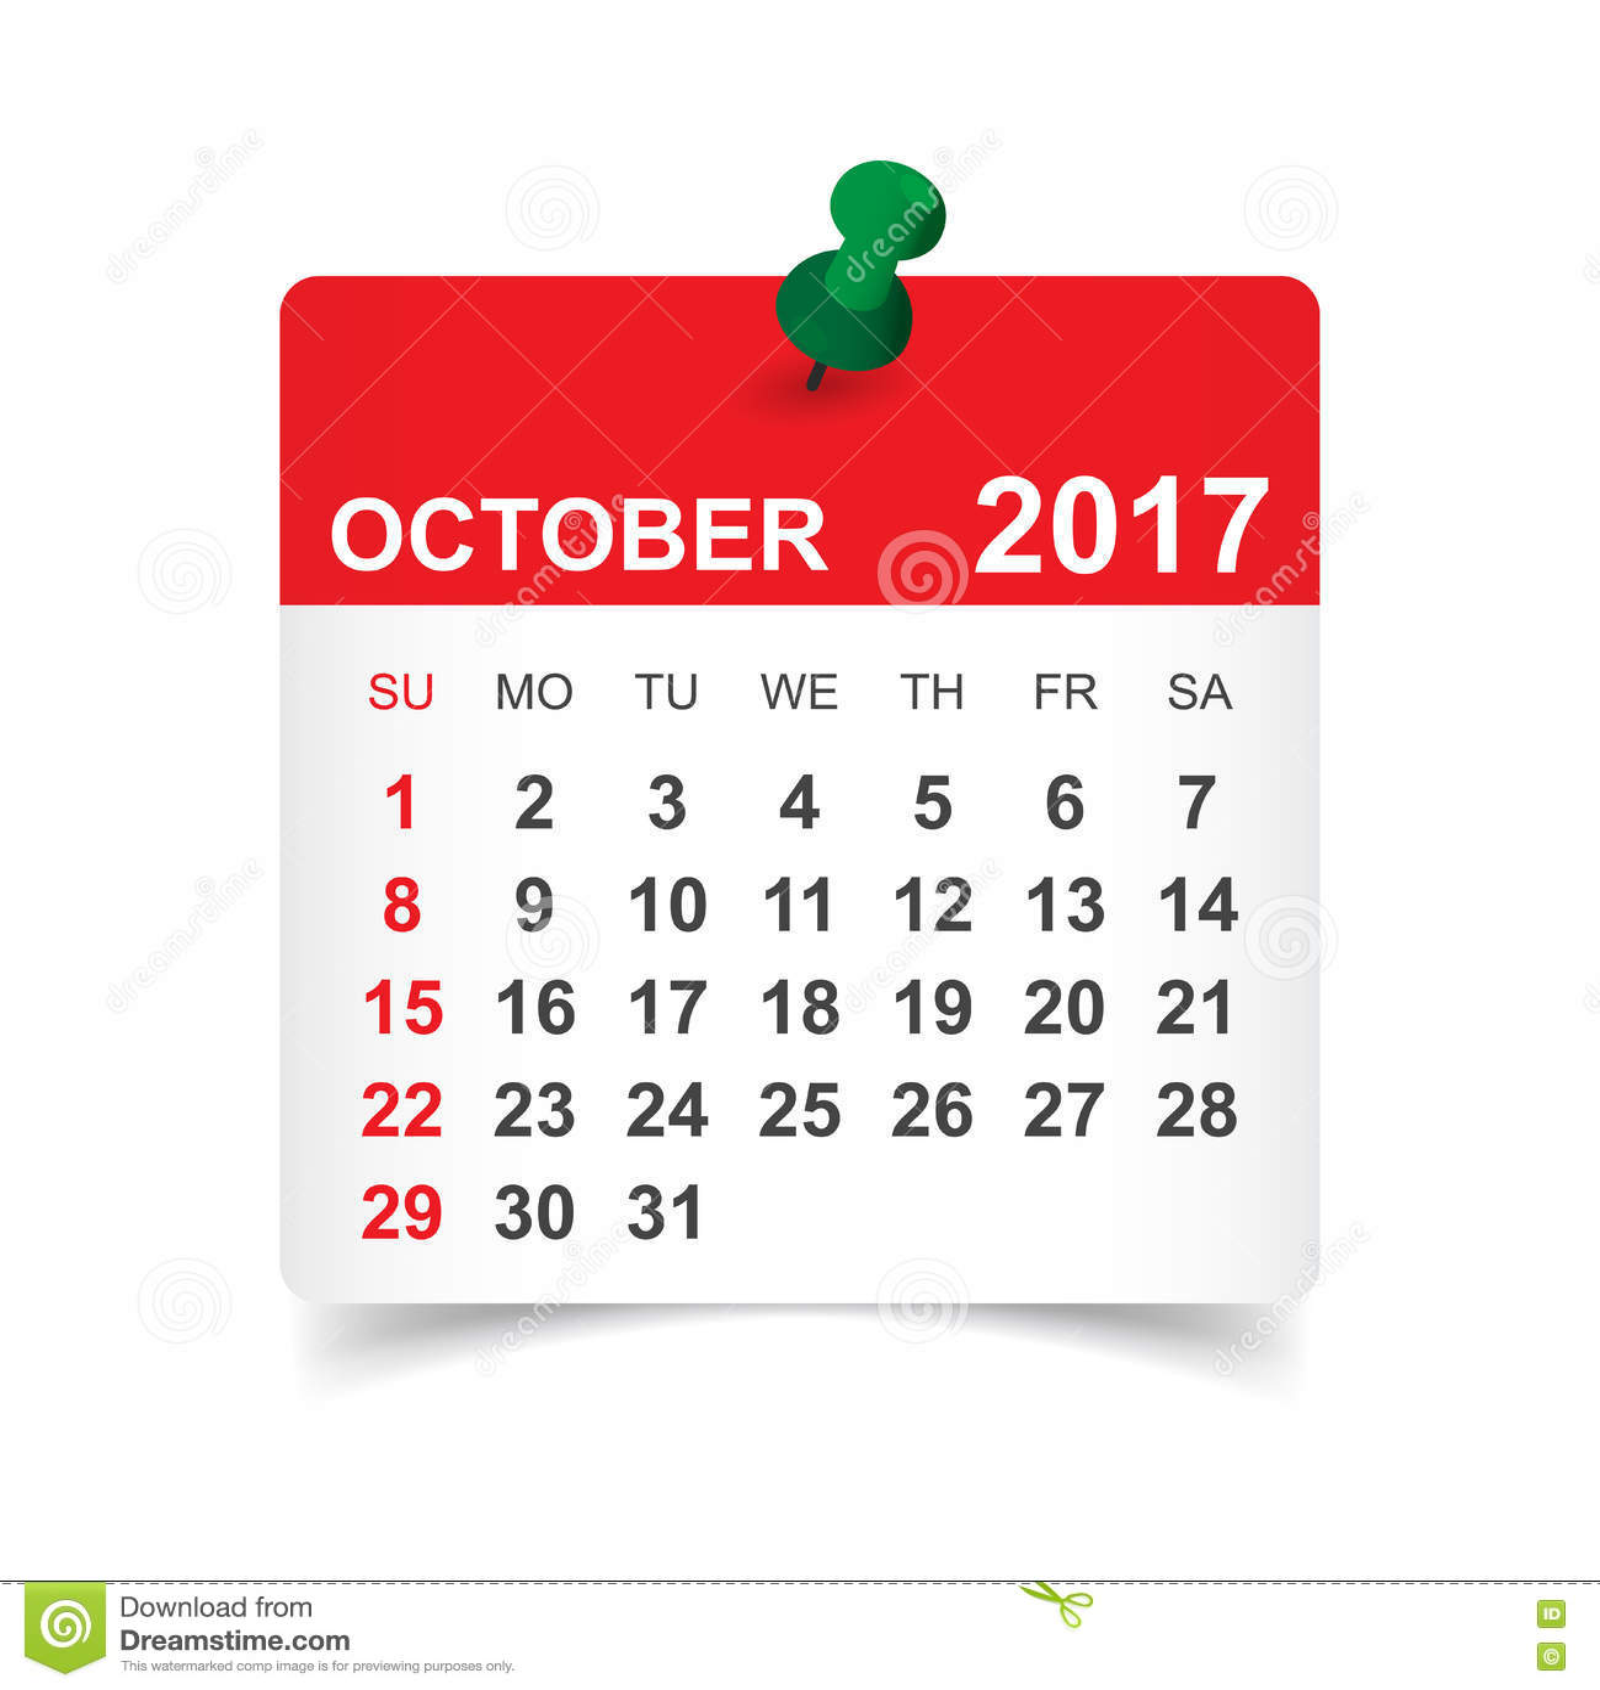 Oktober 2017 kalender